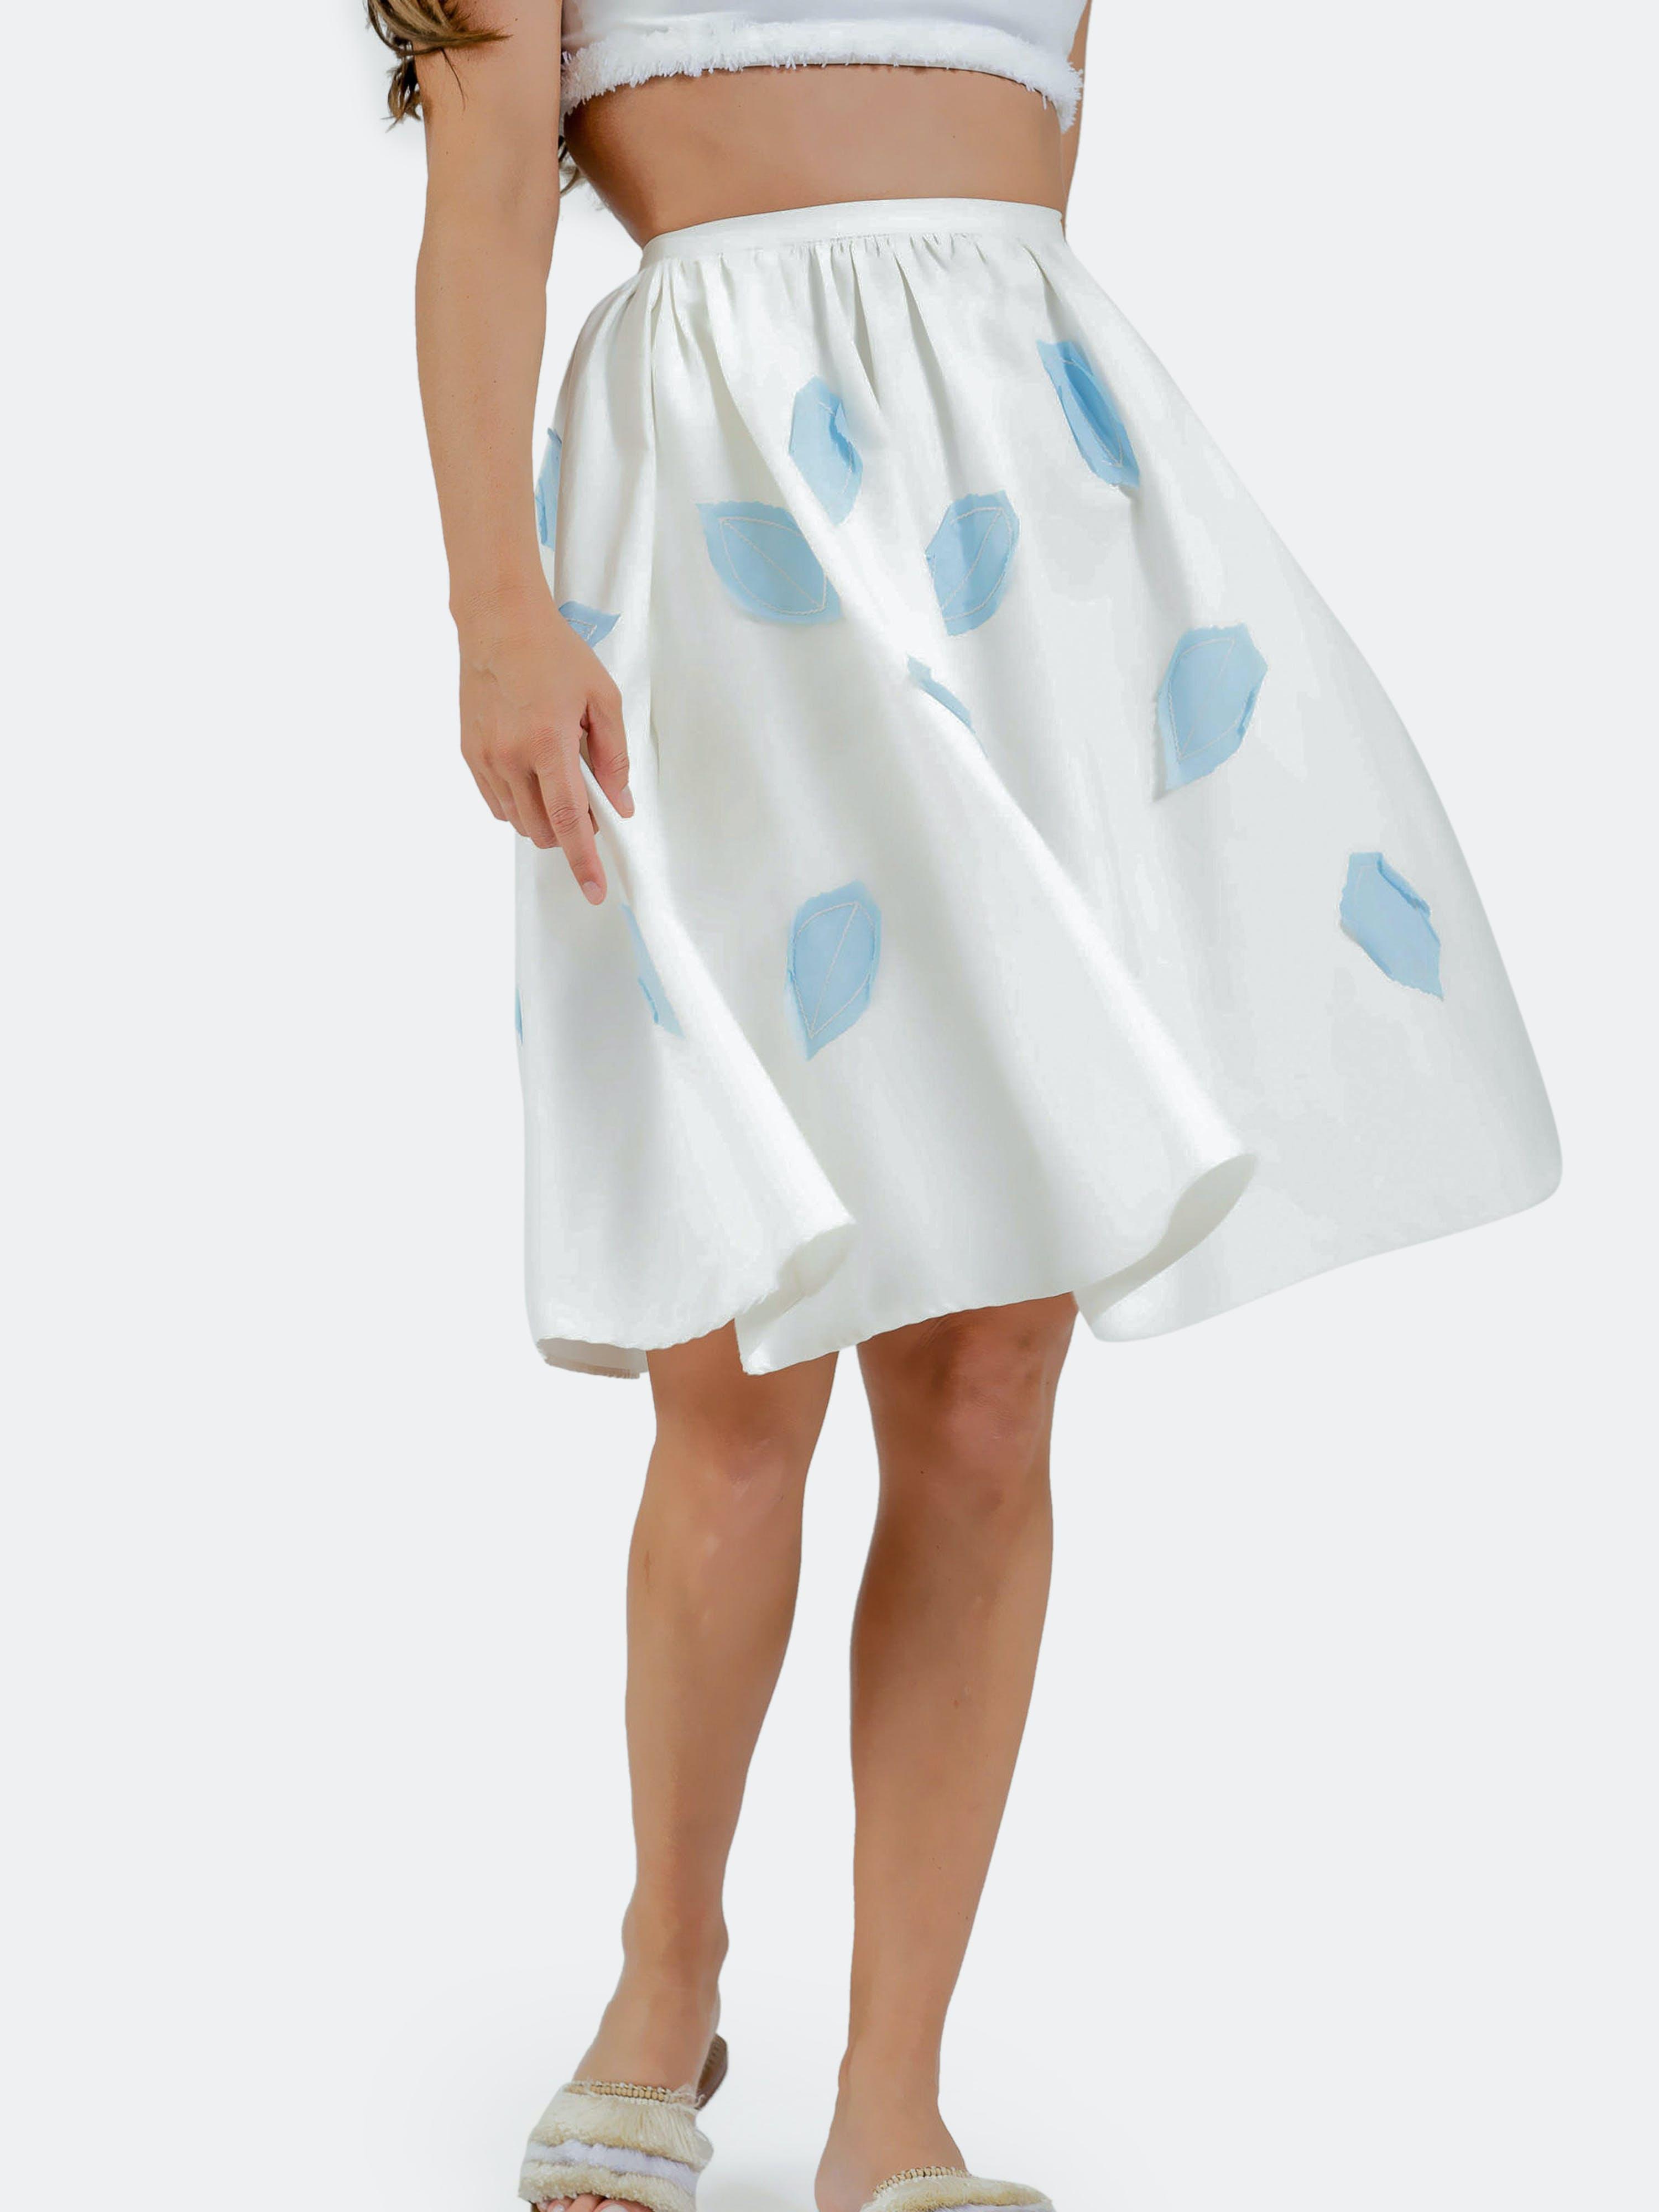 Palmier Meadow Lane Garden Skirt - XS - Also in: S, L, M  - White